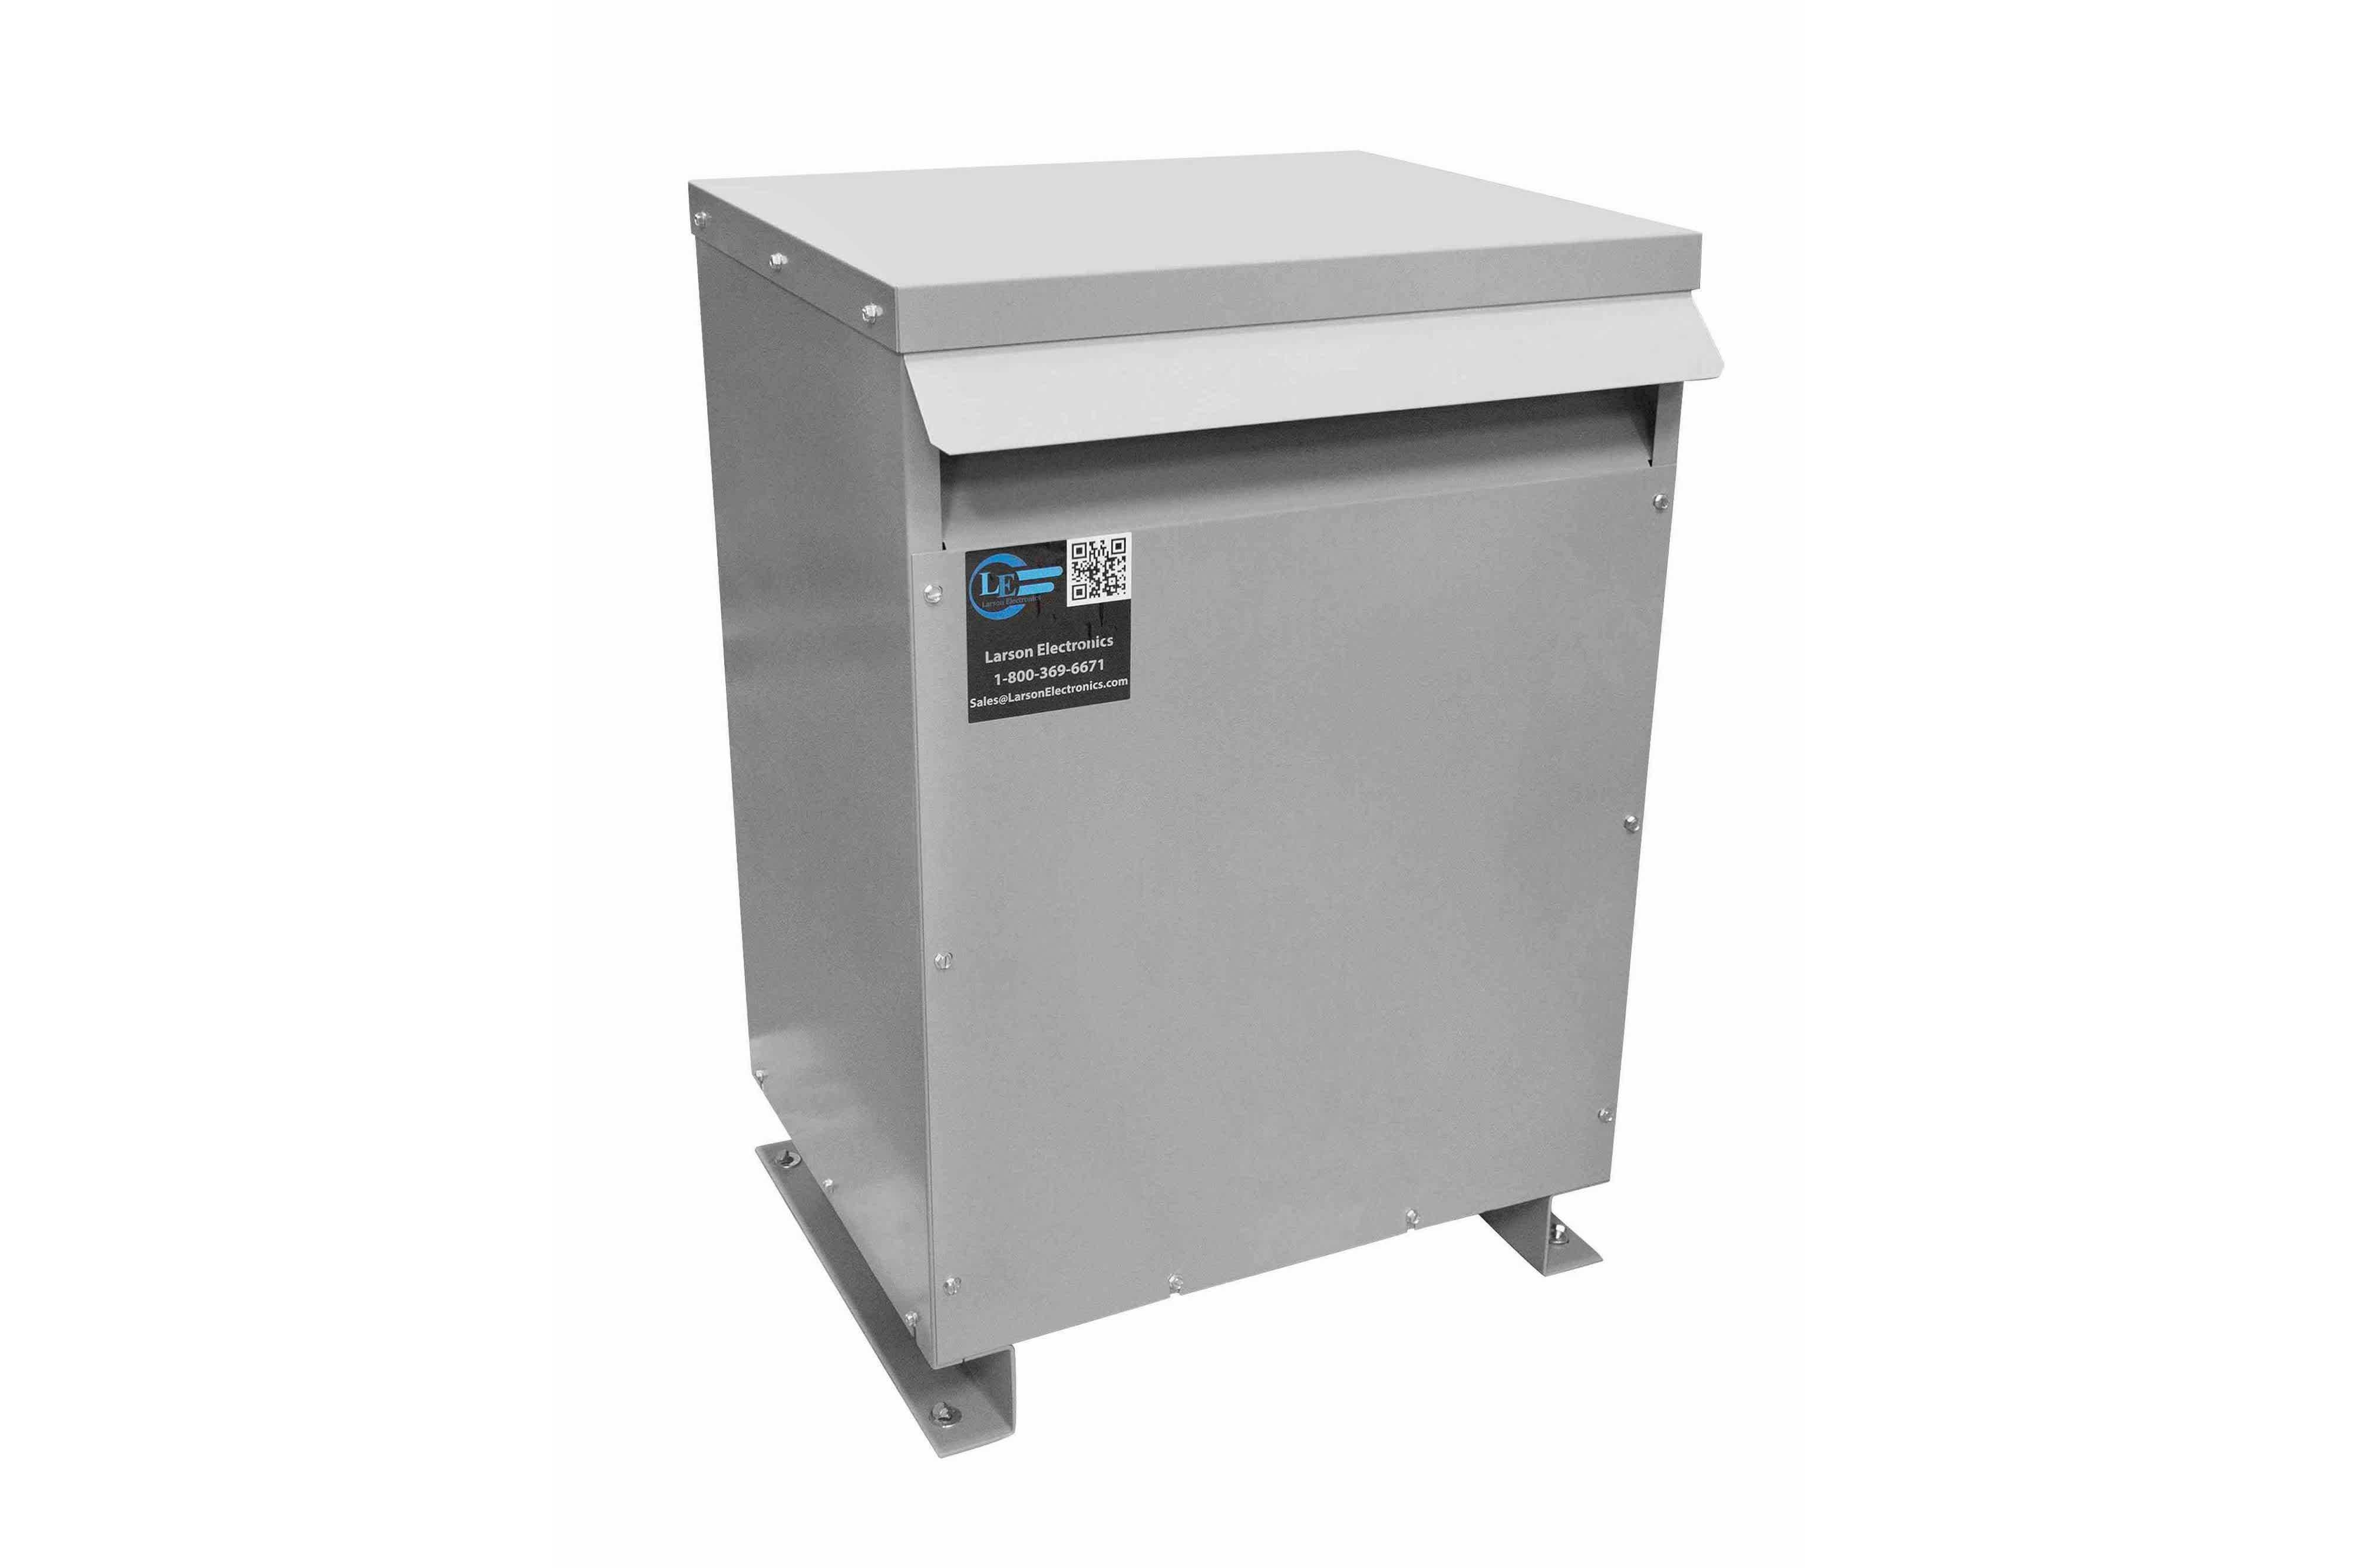 167 kVA 3PH DOE Transformer, 230V Delta Primary, 480Y/277 Wye-N Secondary, N3R, Ventilated, 60 Hz